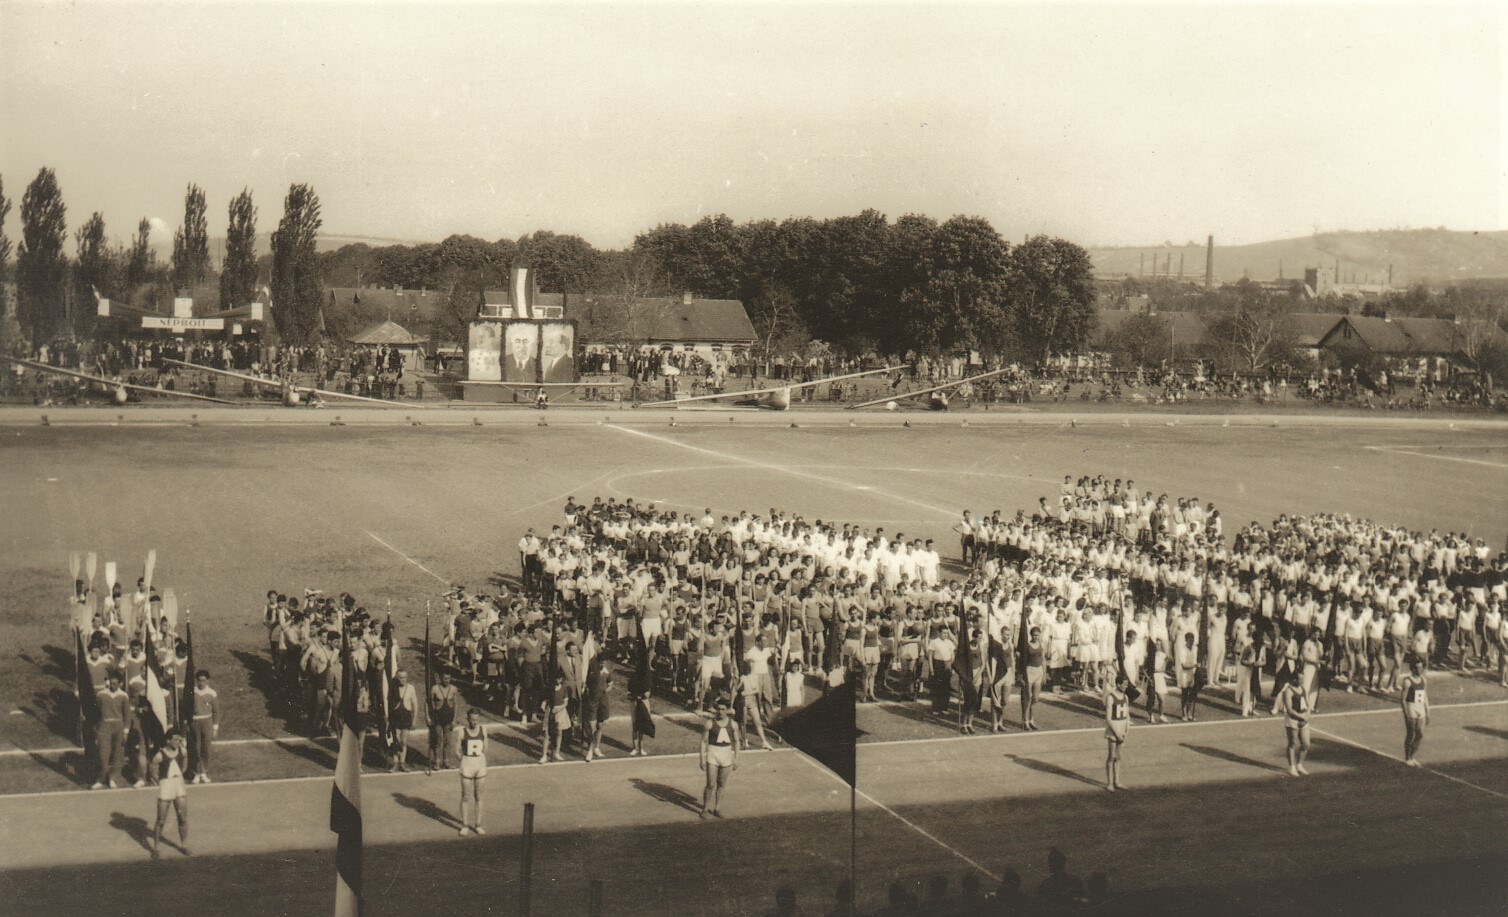 85_253_65_1_tornaunnepely_a_diosgyori_stadionban_1945-50.jpg